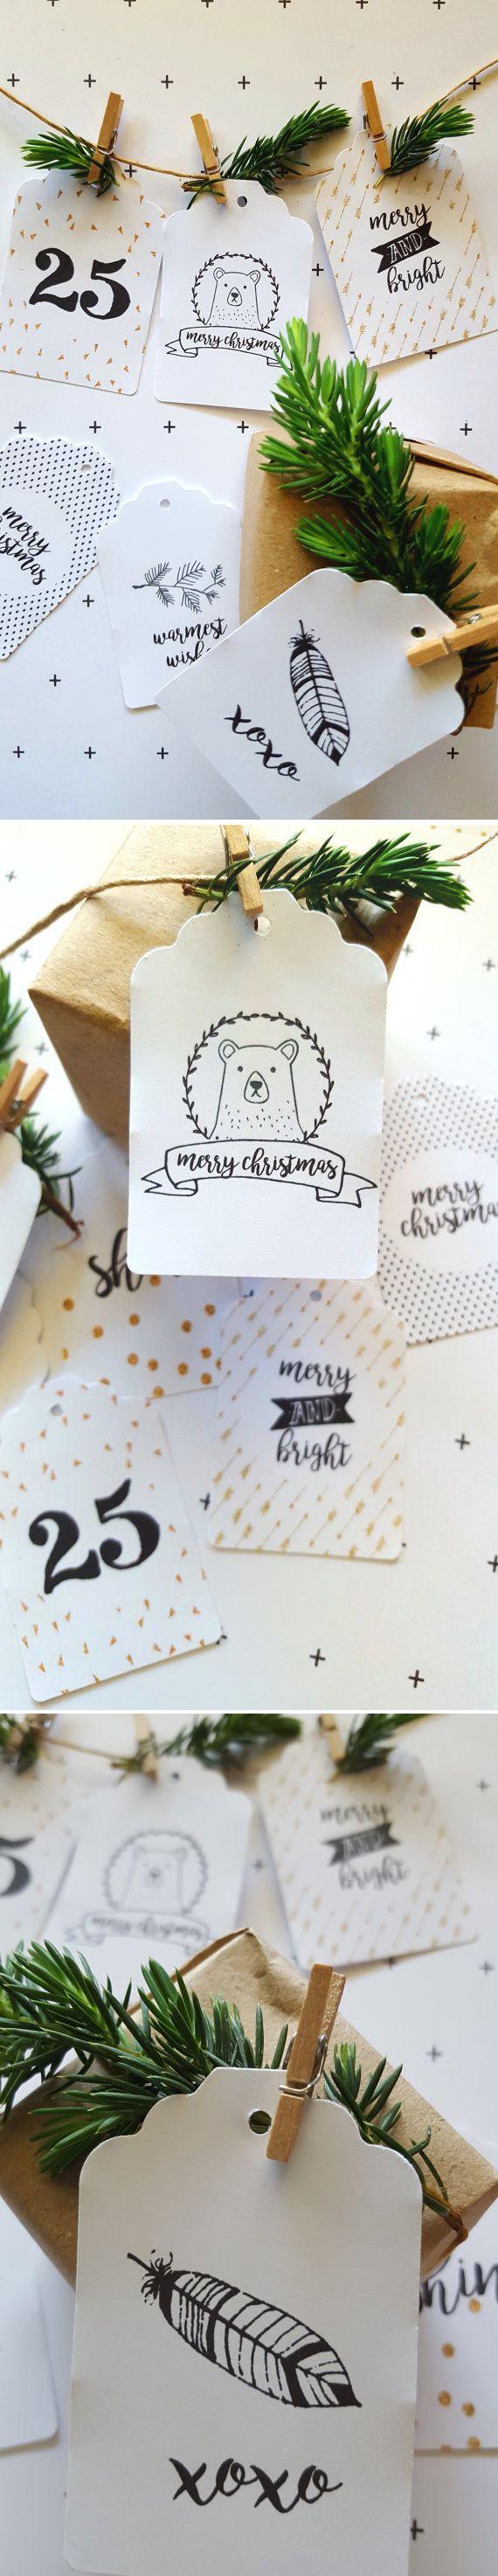 Makeforgood Modern Gold Merry Christmas Gift Tags / Merry and Bright Gift Tags/ Gold Christmas/ Boho Deer/ Woodland Christmas / ThePaperBirdcage